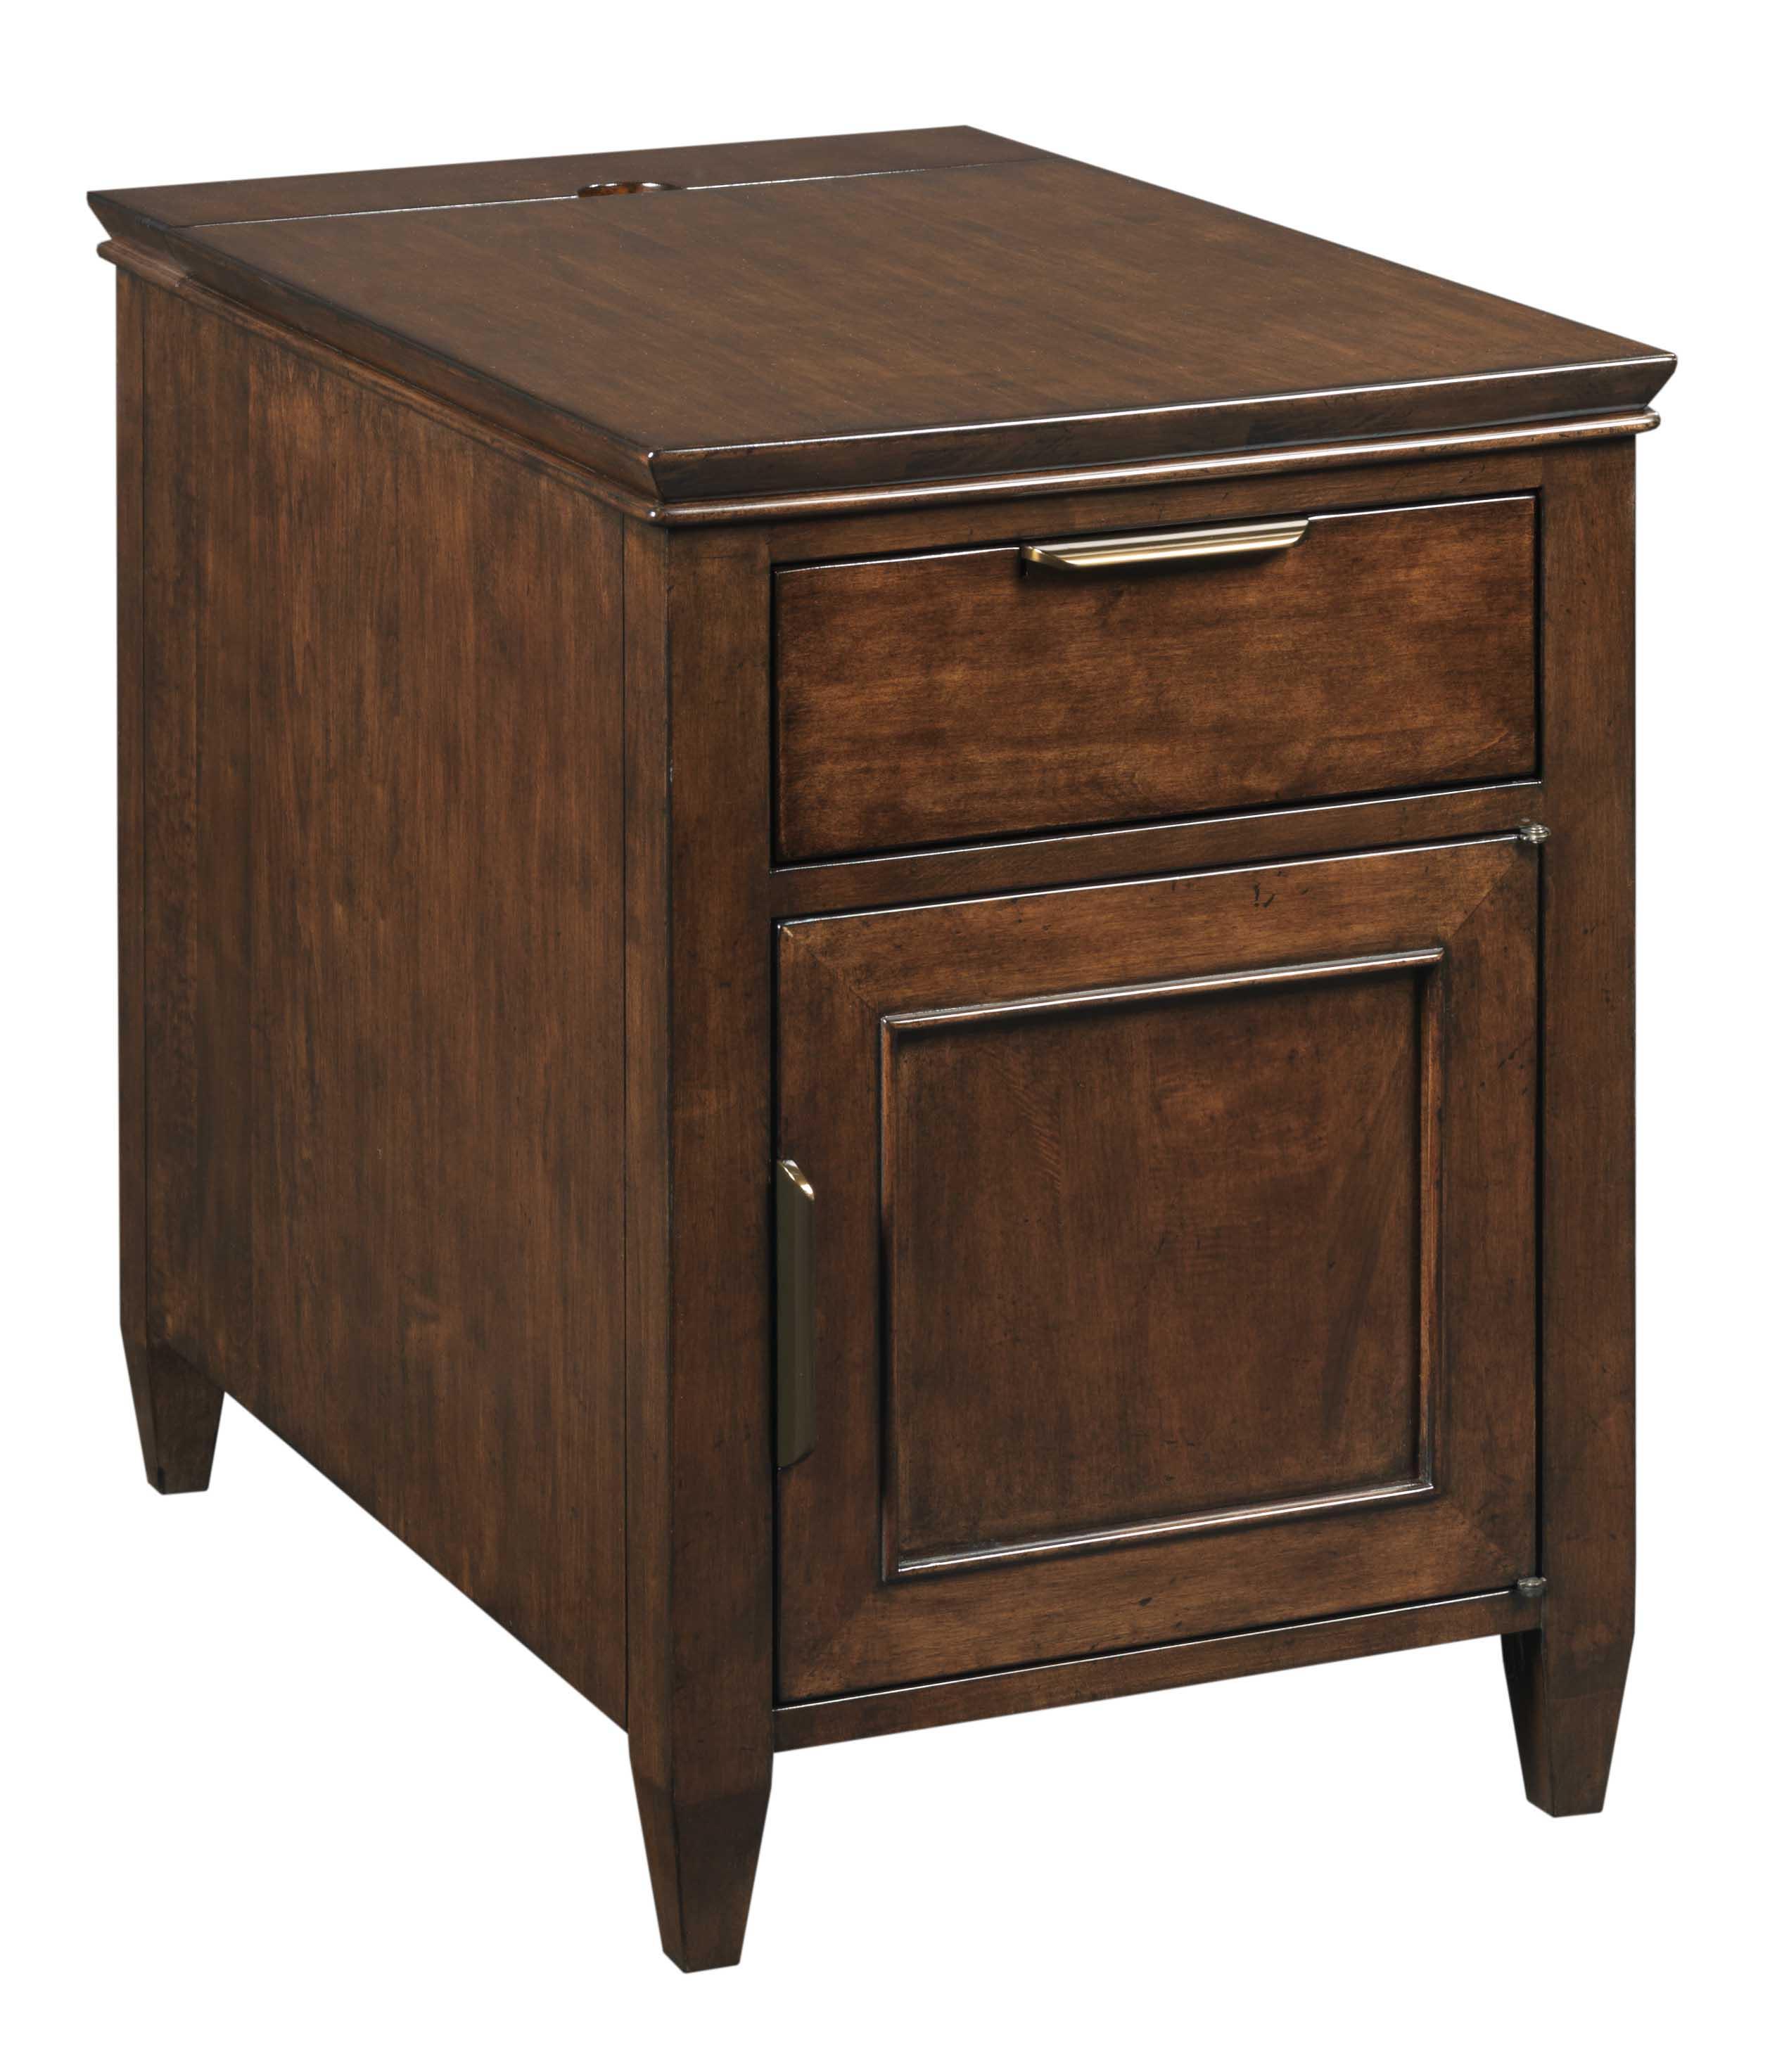 Kincaid Furniture Elise Elise Chairside Chest - Item Number: 77-026